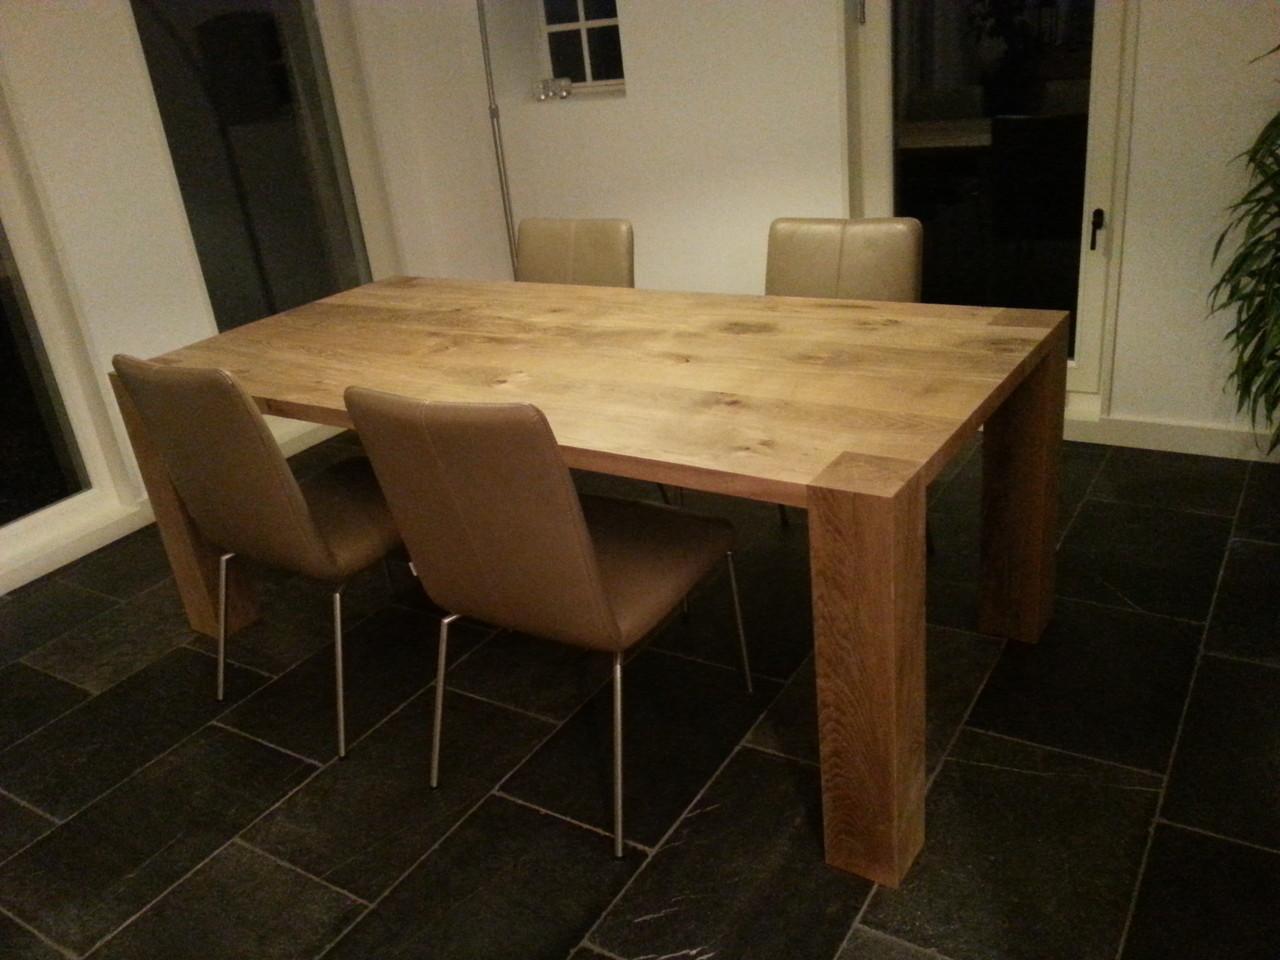 Vierkante eettafel ikea elegant affordable vierkante eettafels